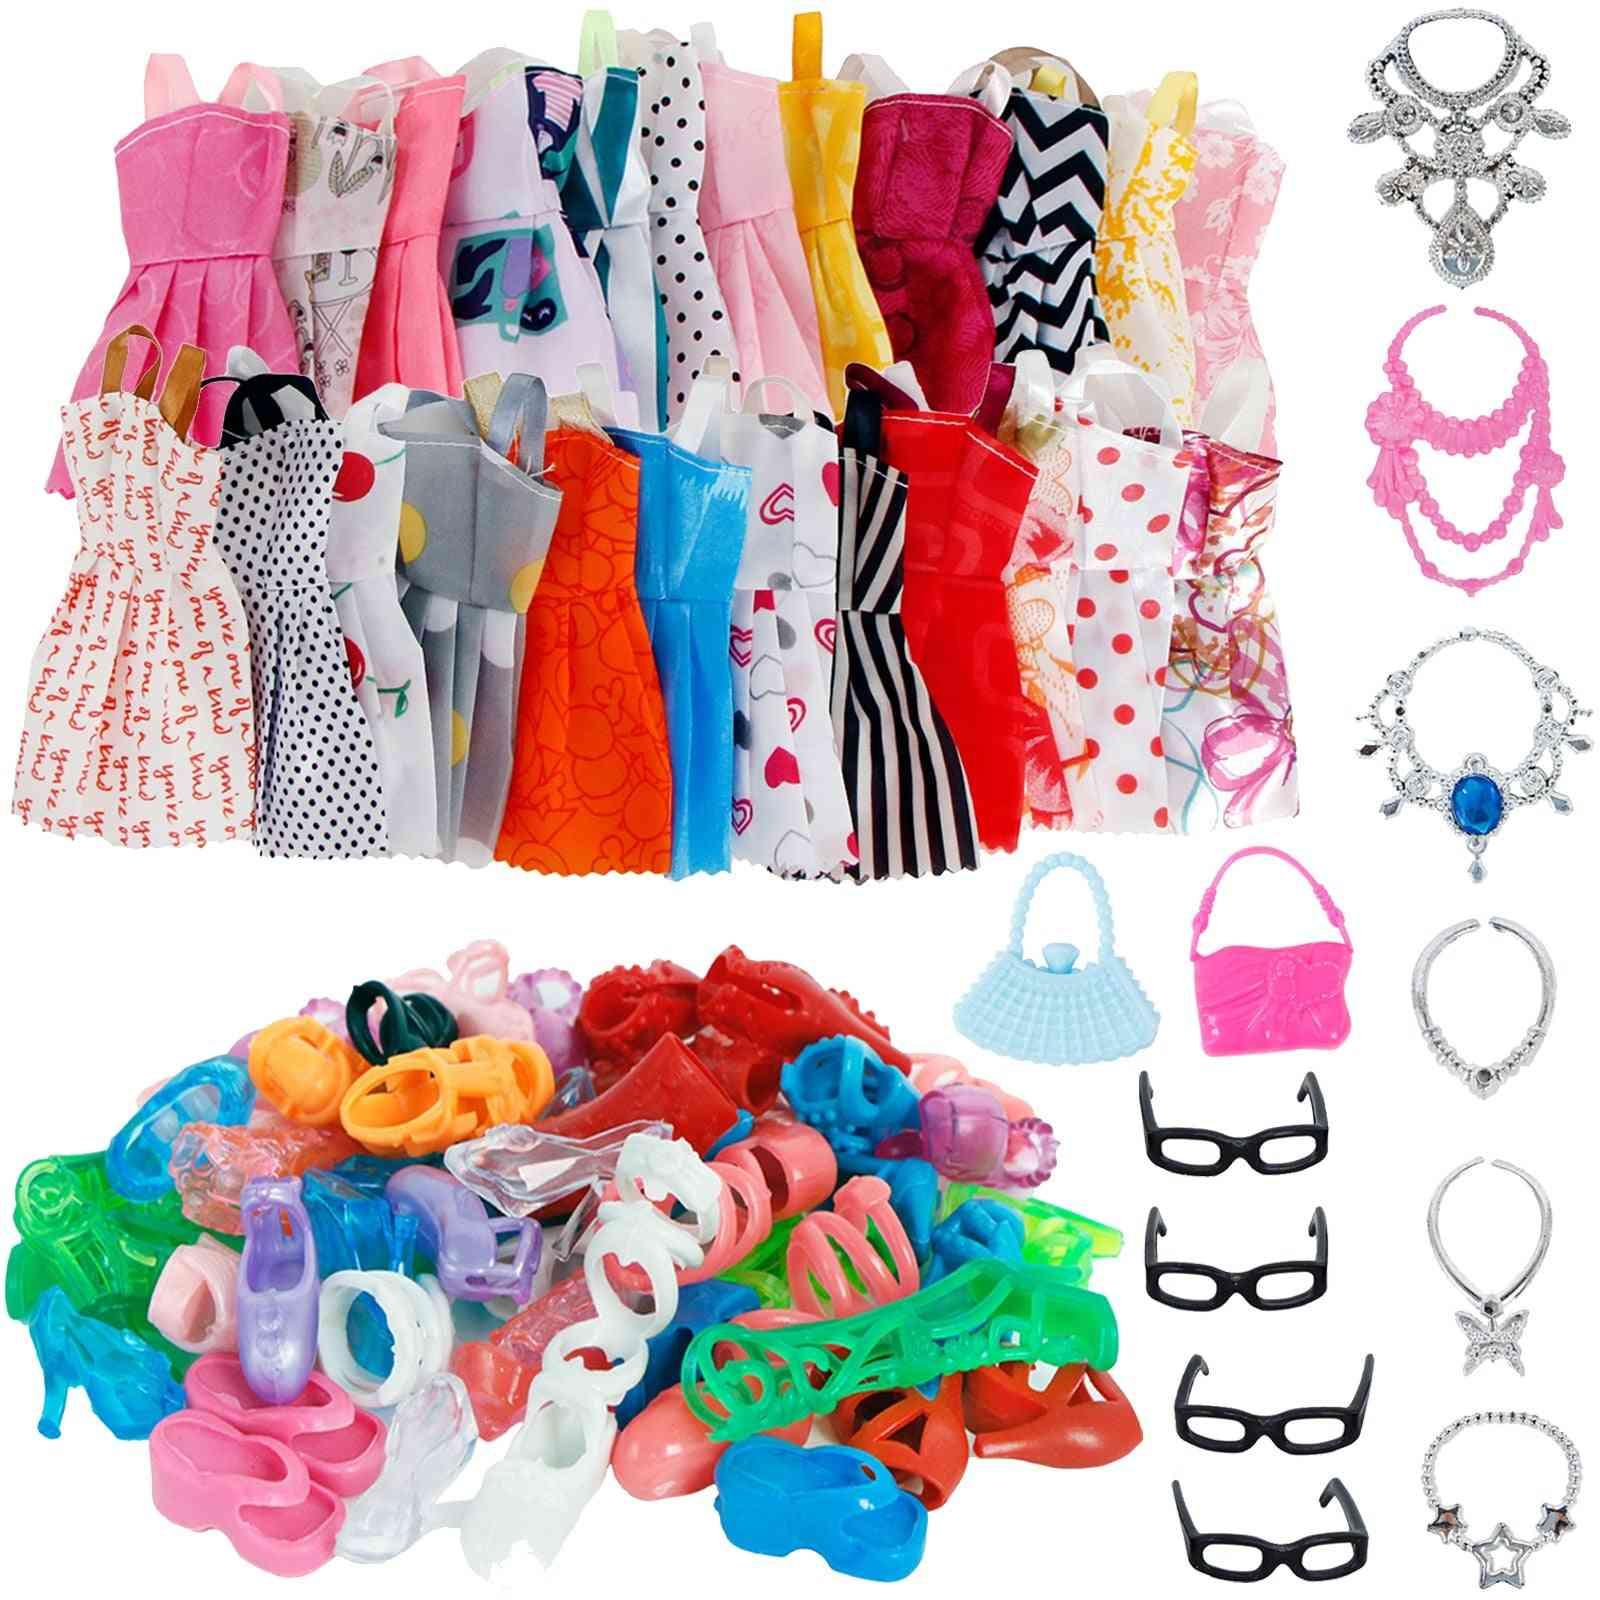 32 Item/set Doll Mix Fashion Cute Dress+ 4 Glasses+ 6 Necklaces+2 Handbag+ 10 Shoes Dress Clothes For Barbie Doll